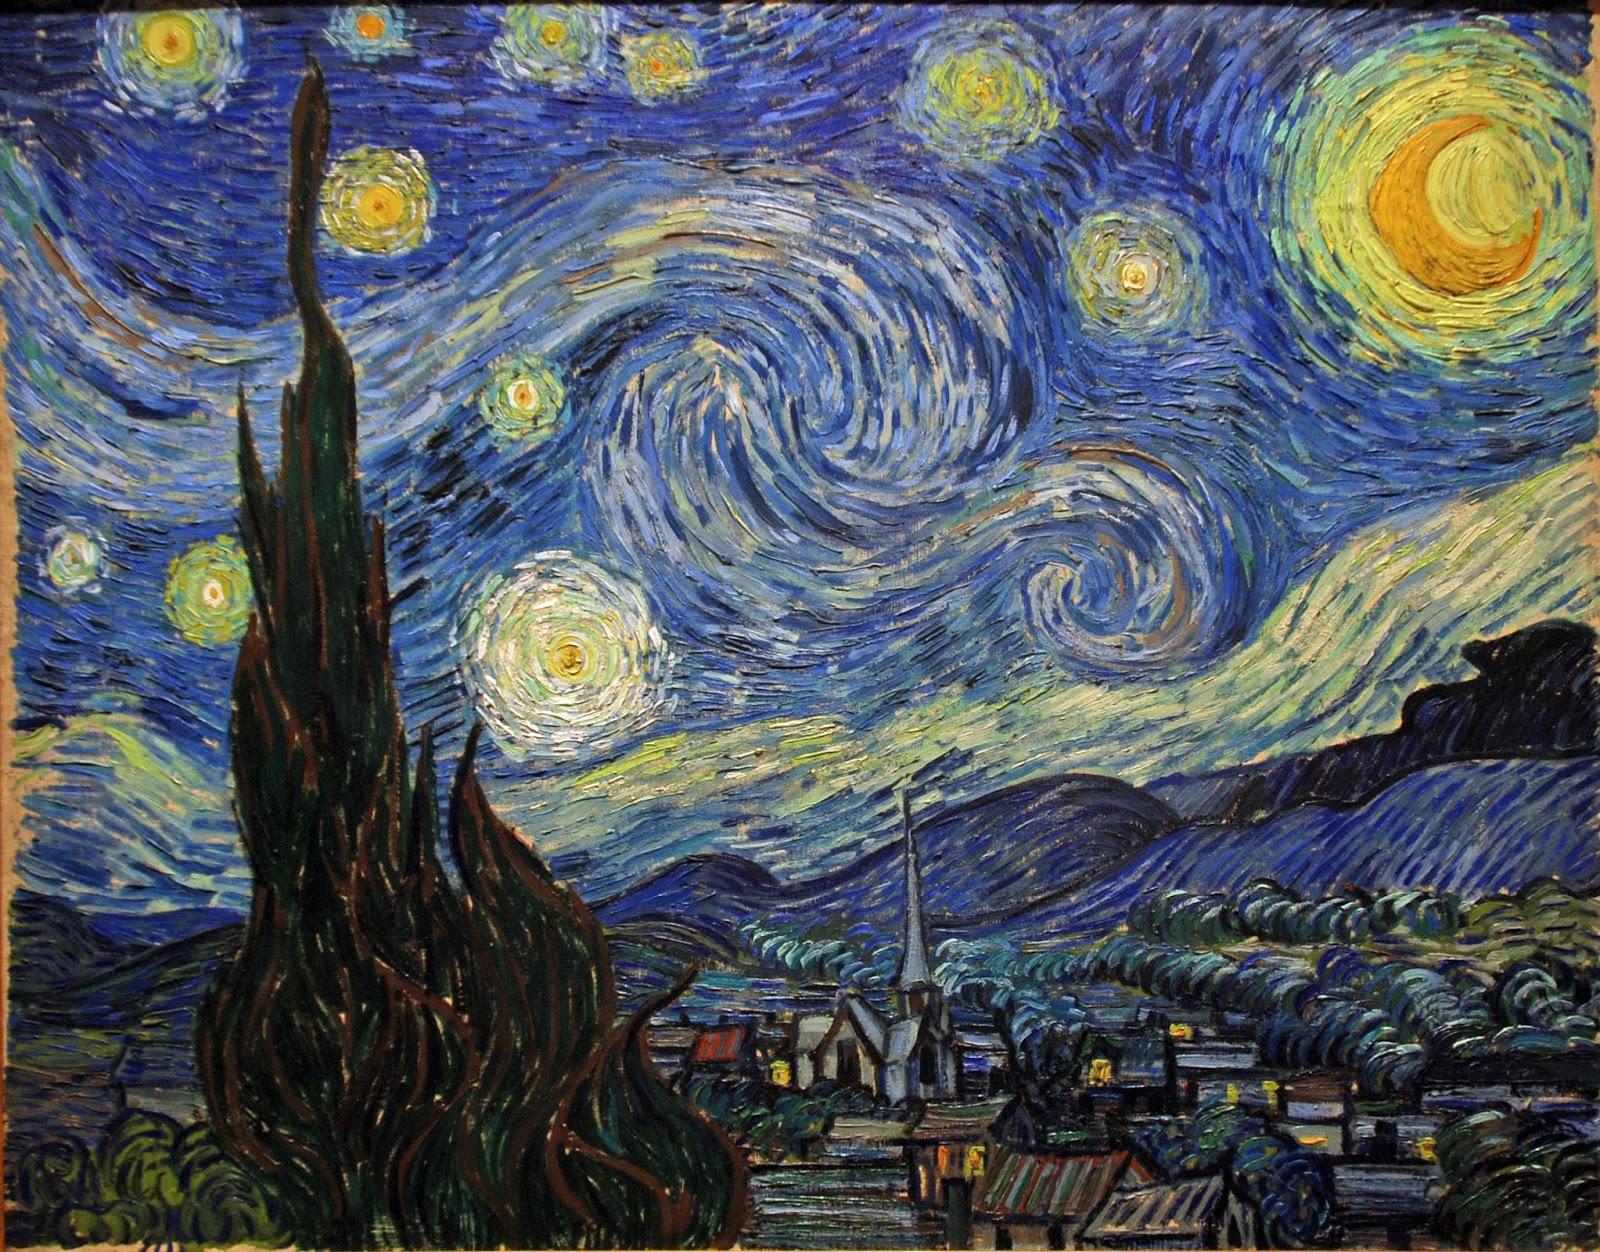 moma-01-1-vincent-van-gogh-starry-night.